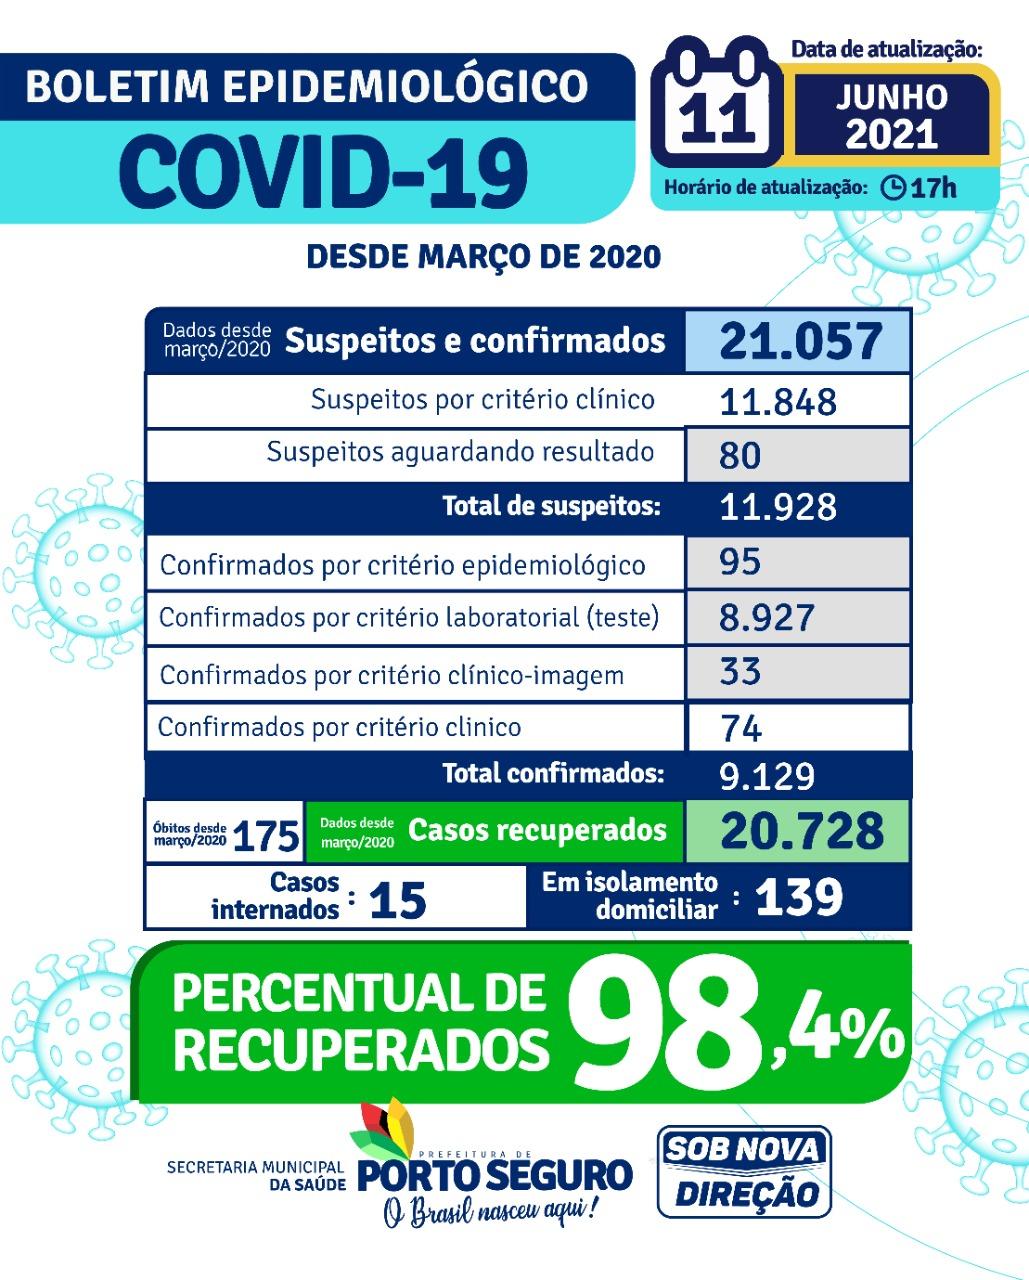 Porto Seguro: Boletim Epidemiológico Covid-19 (11/Junho) 29